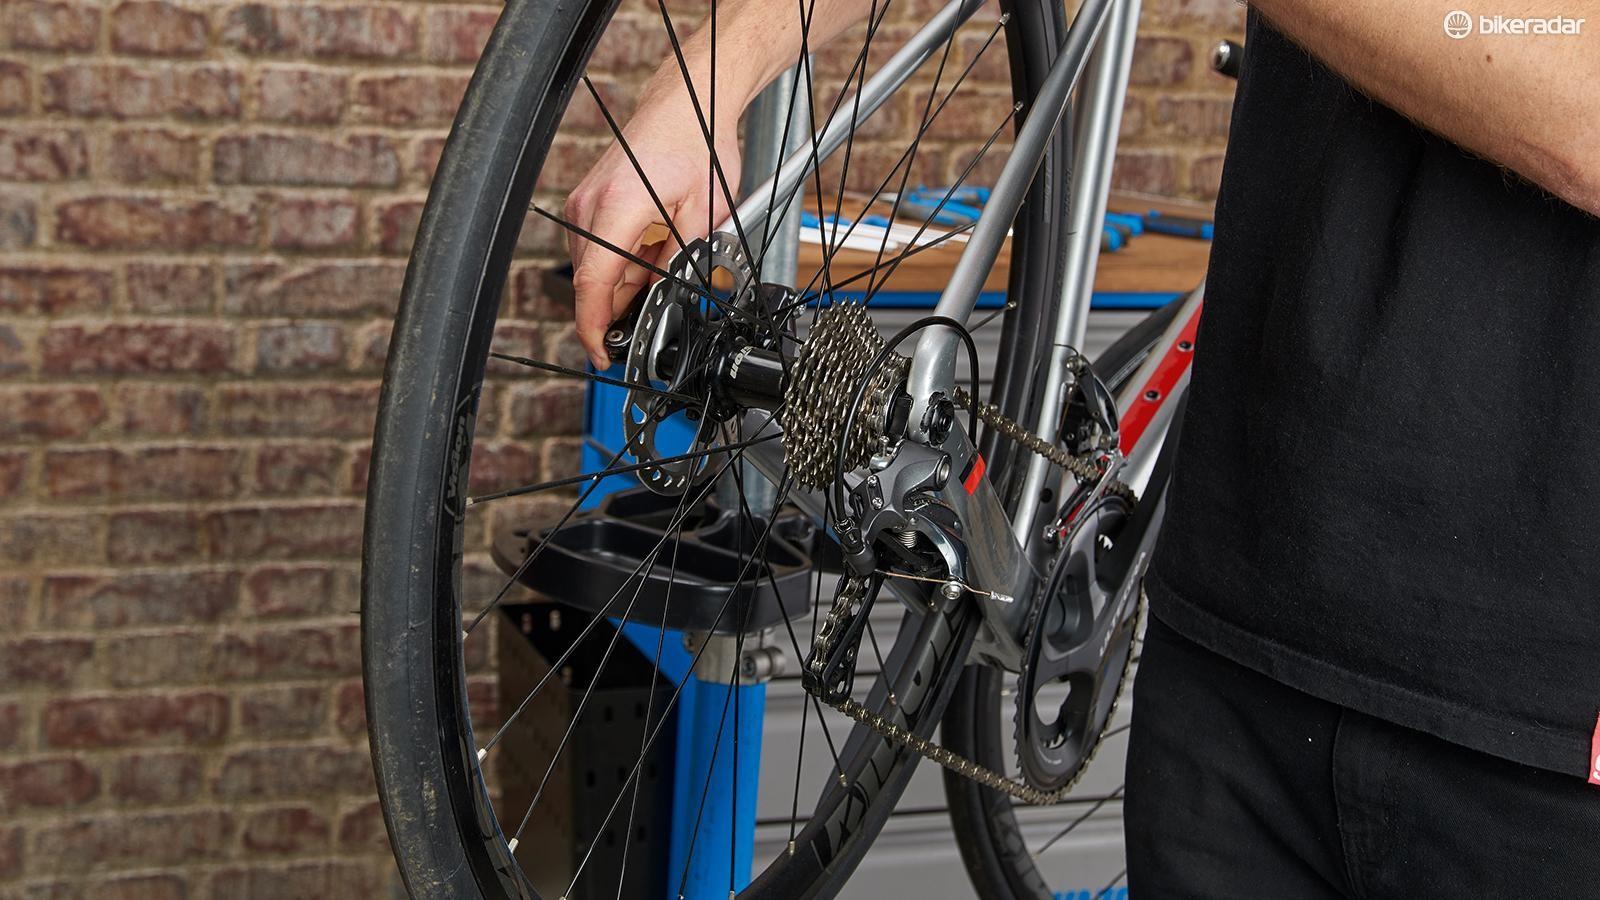 Rear wheel removal